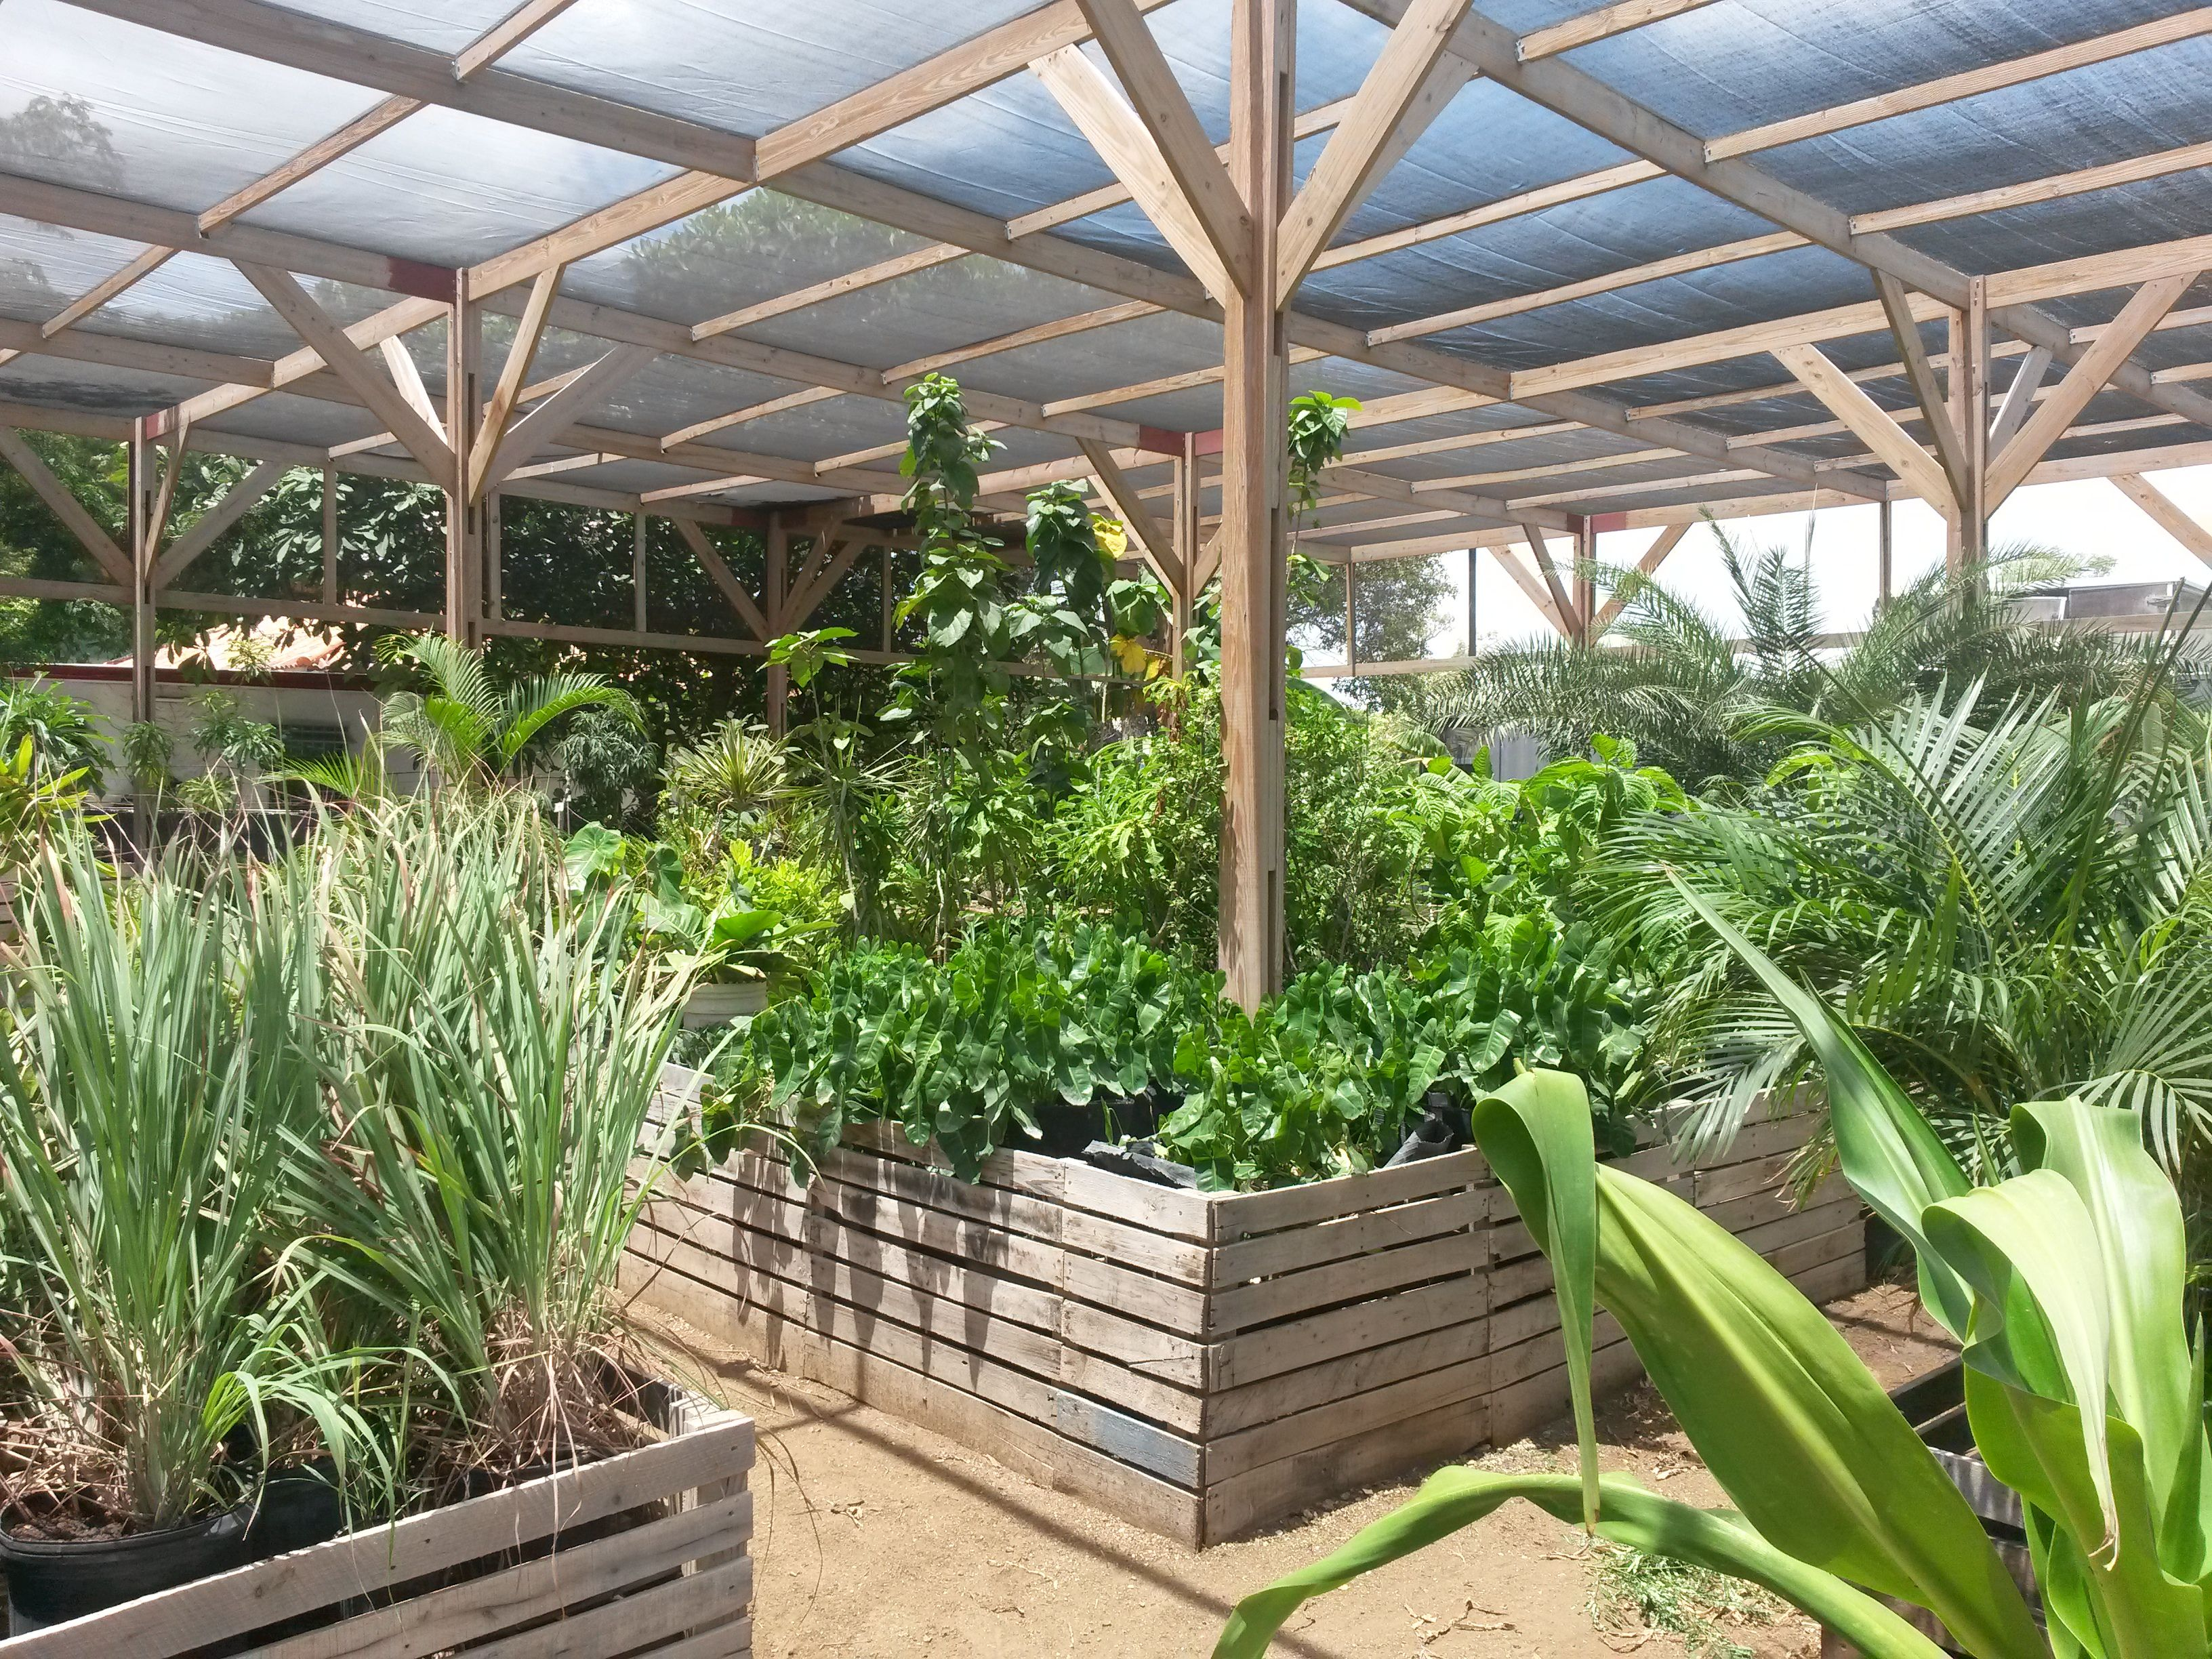 Le Jardin Nursery Garden Center At Baoase Luxury Resort 640 x 480